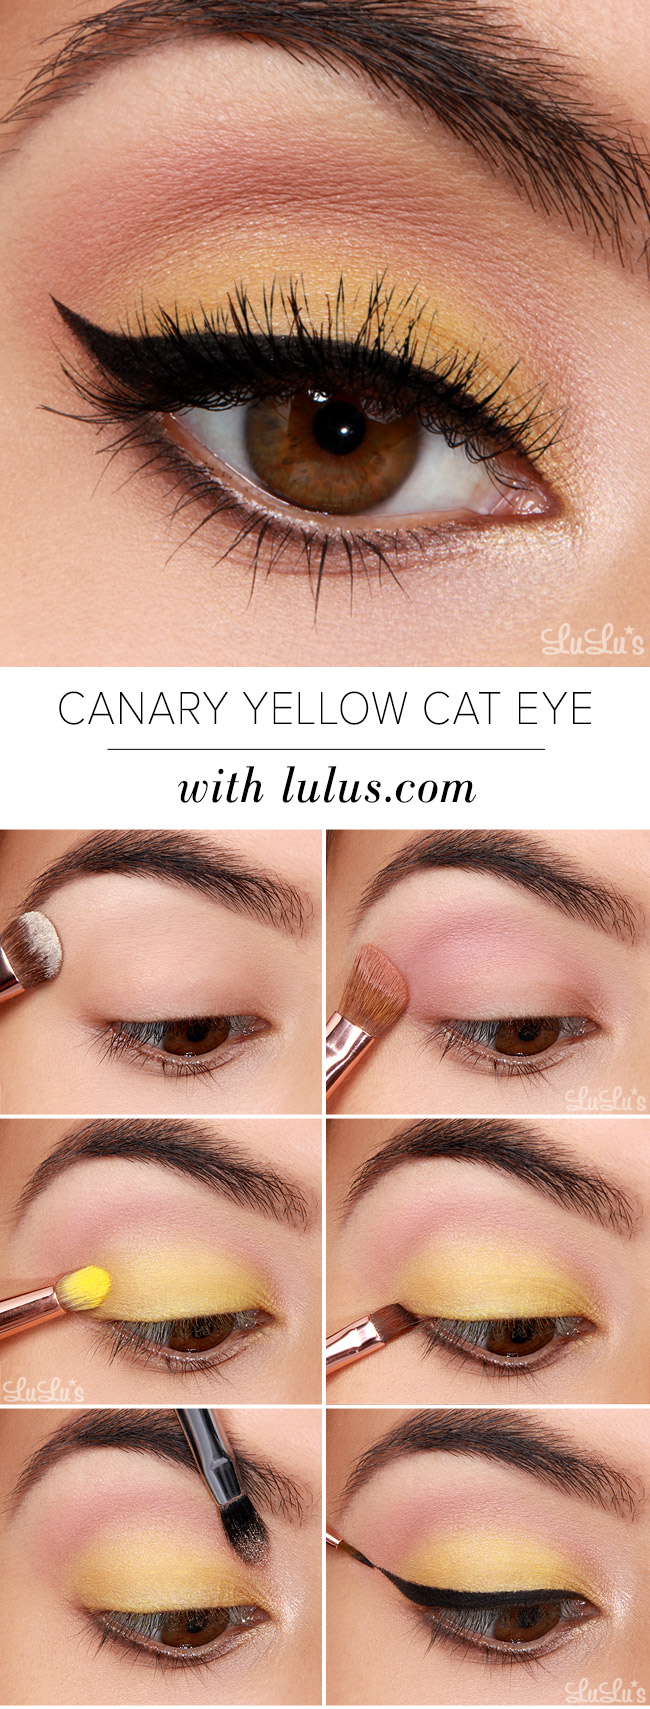 canary-yellow-cat-eyes-